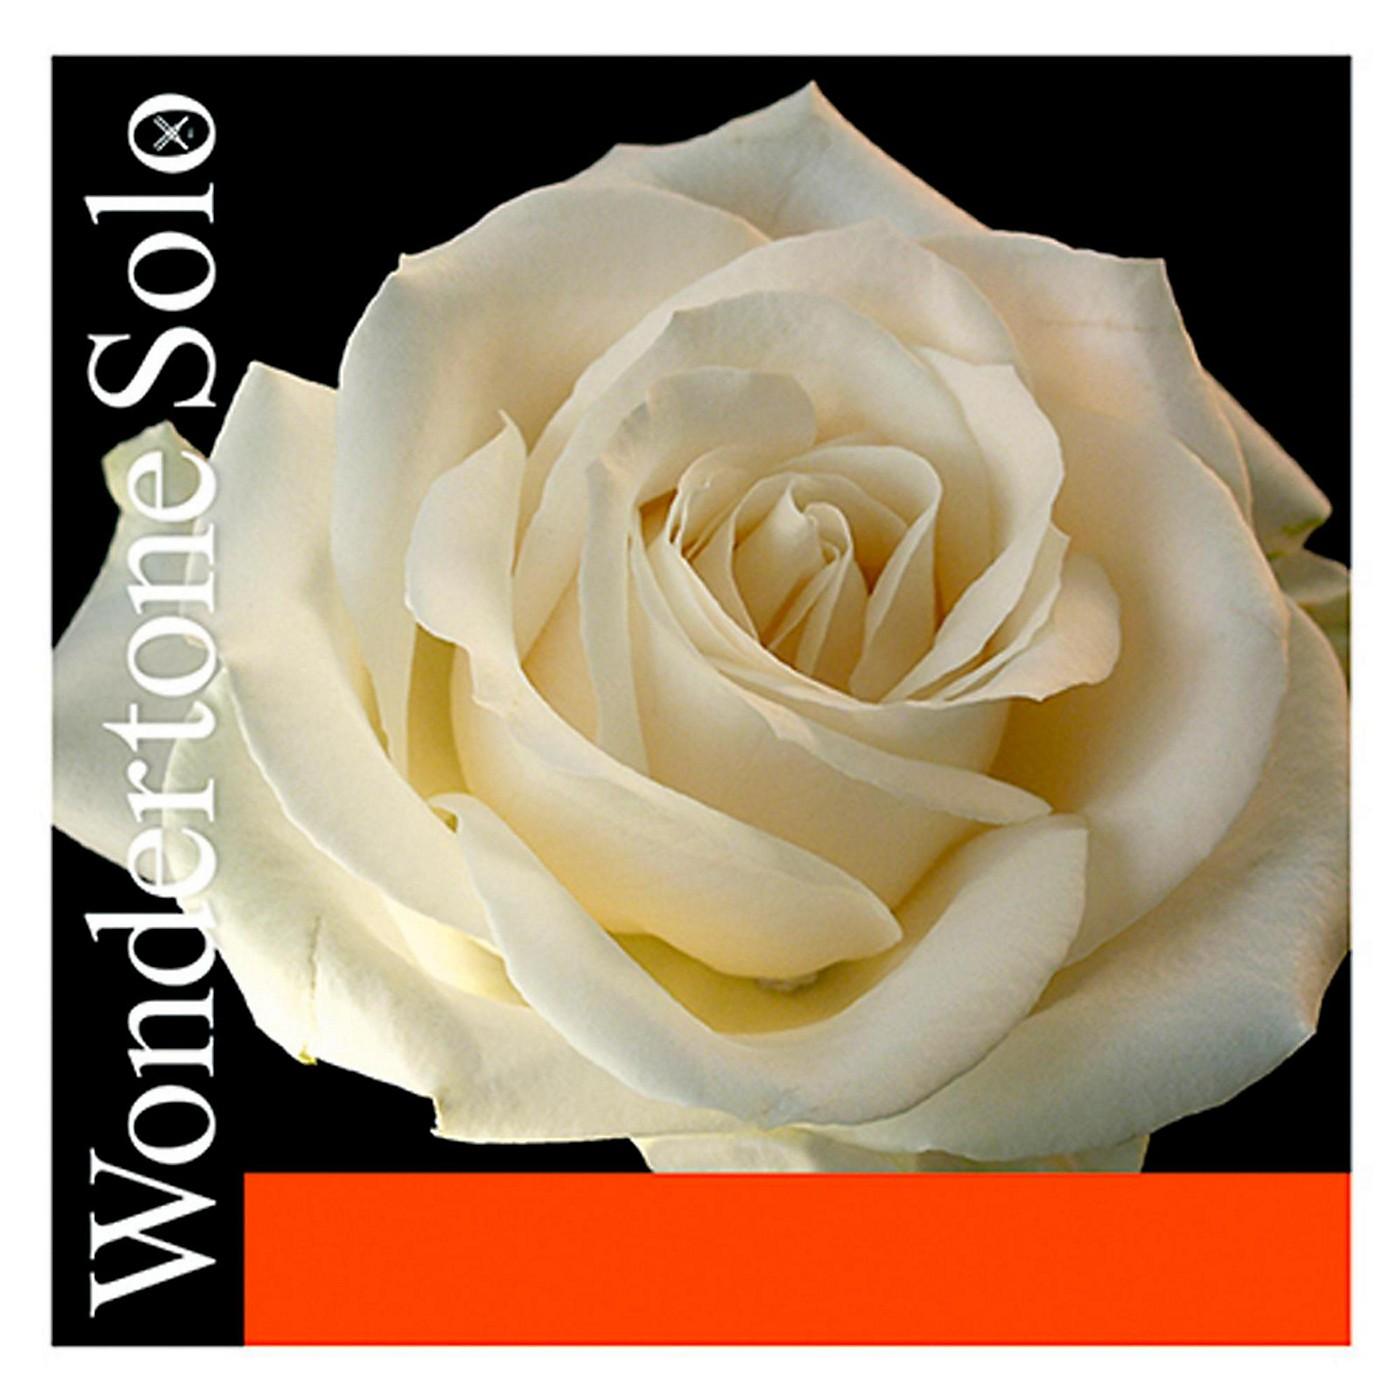 Pirastro Wondertone Solo Series Violin String Set thumbnail